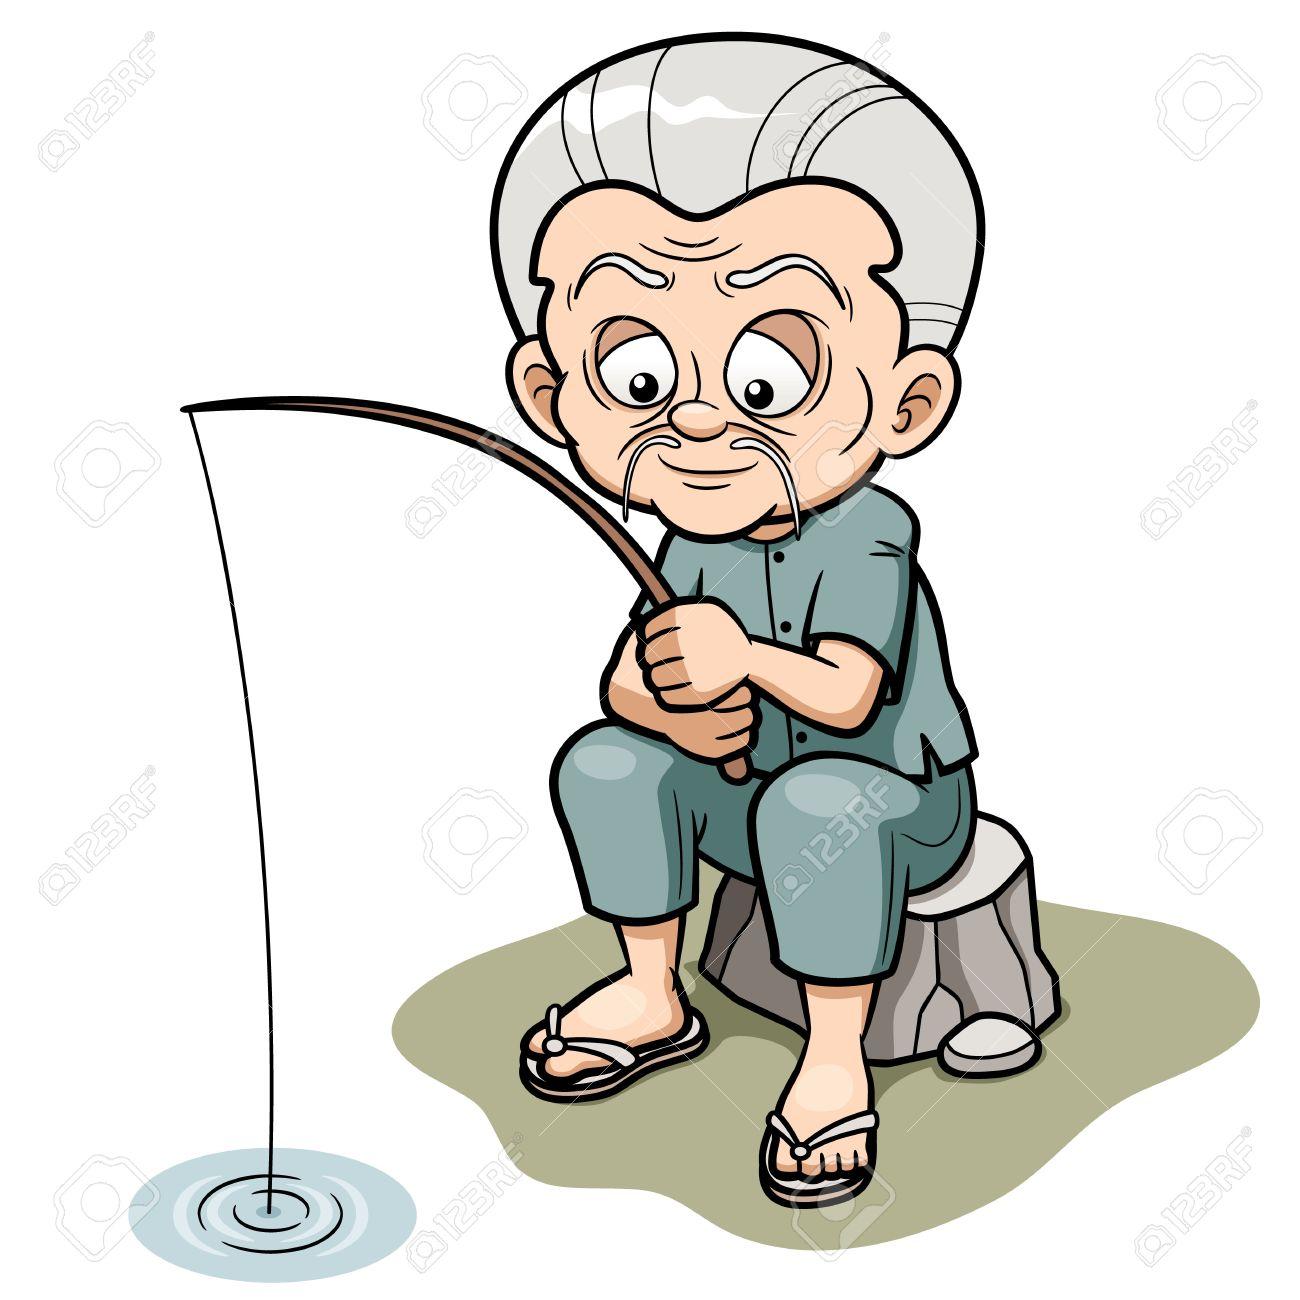 1300x1300 Vector Illustration Of Cartoon Old Man Fishing Royalty Free